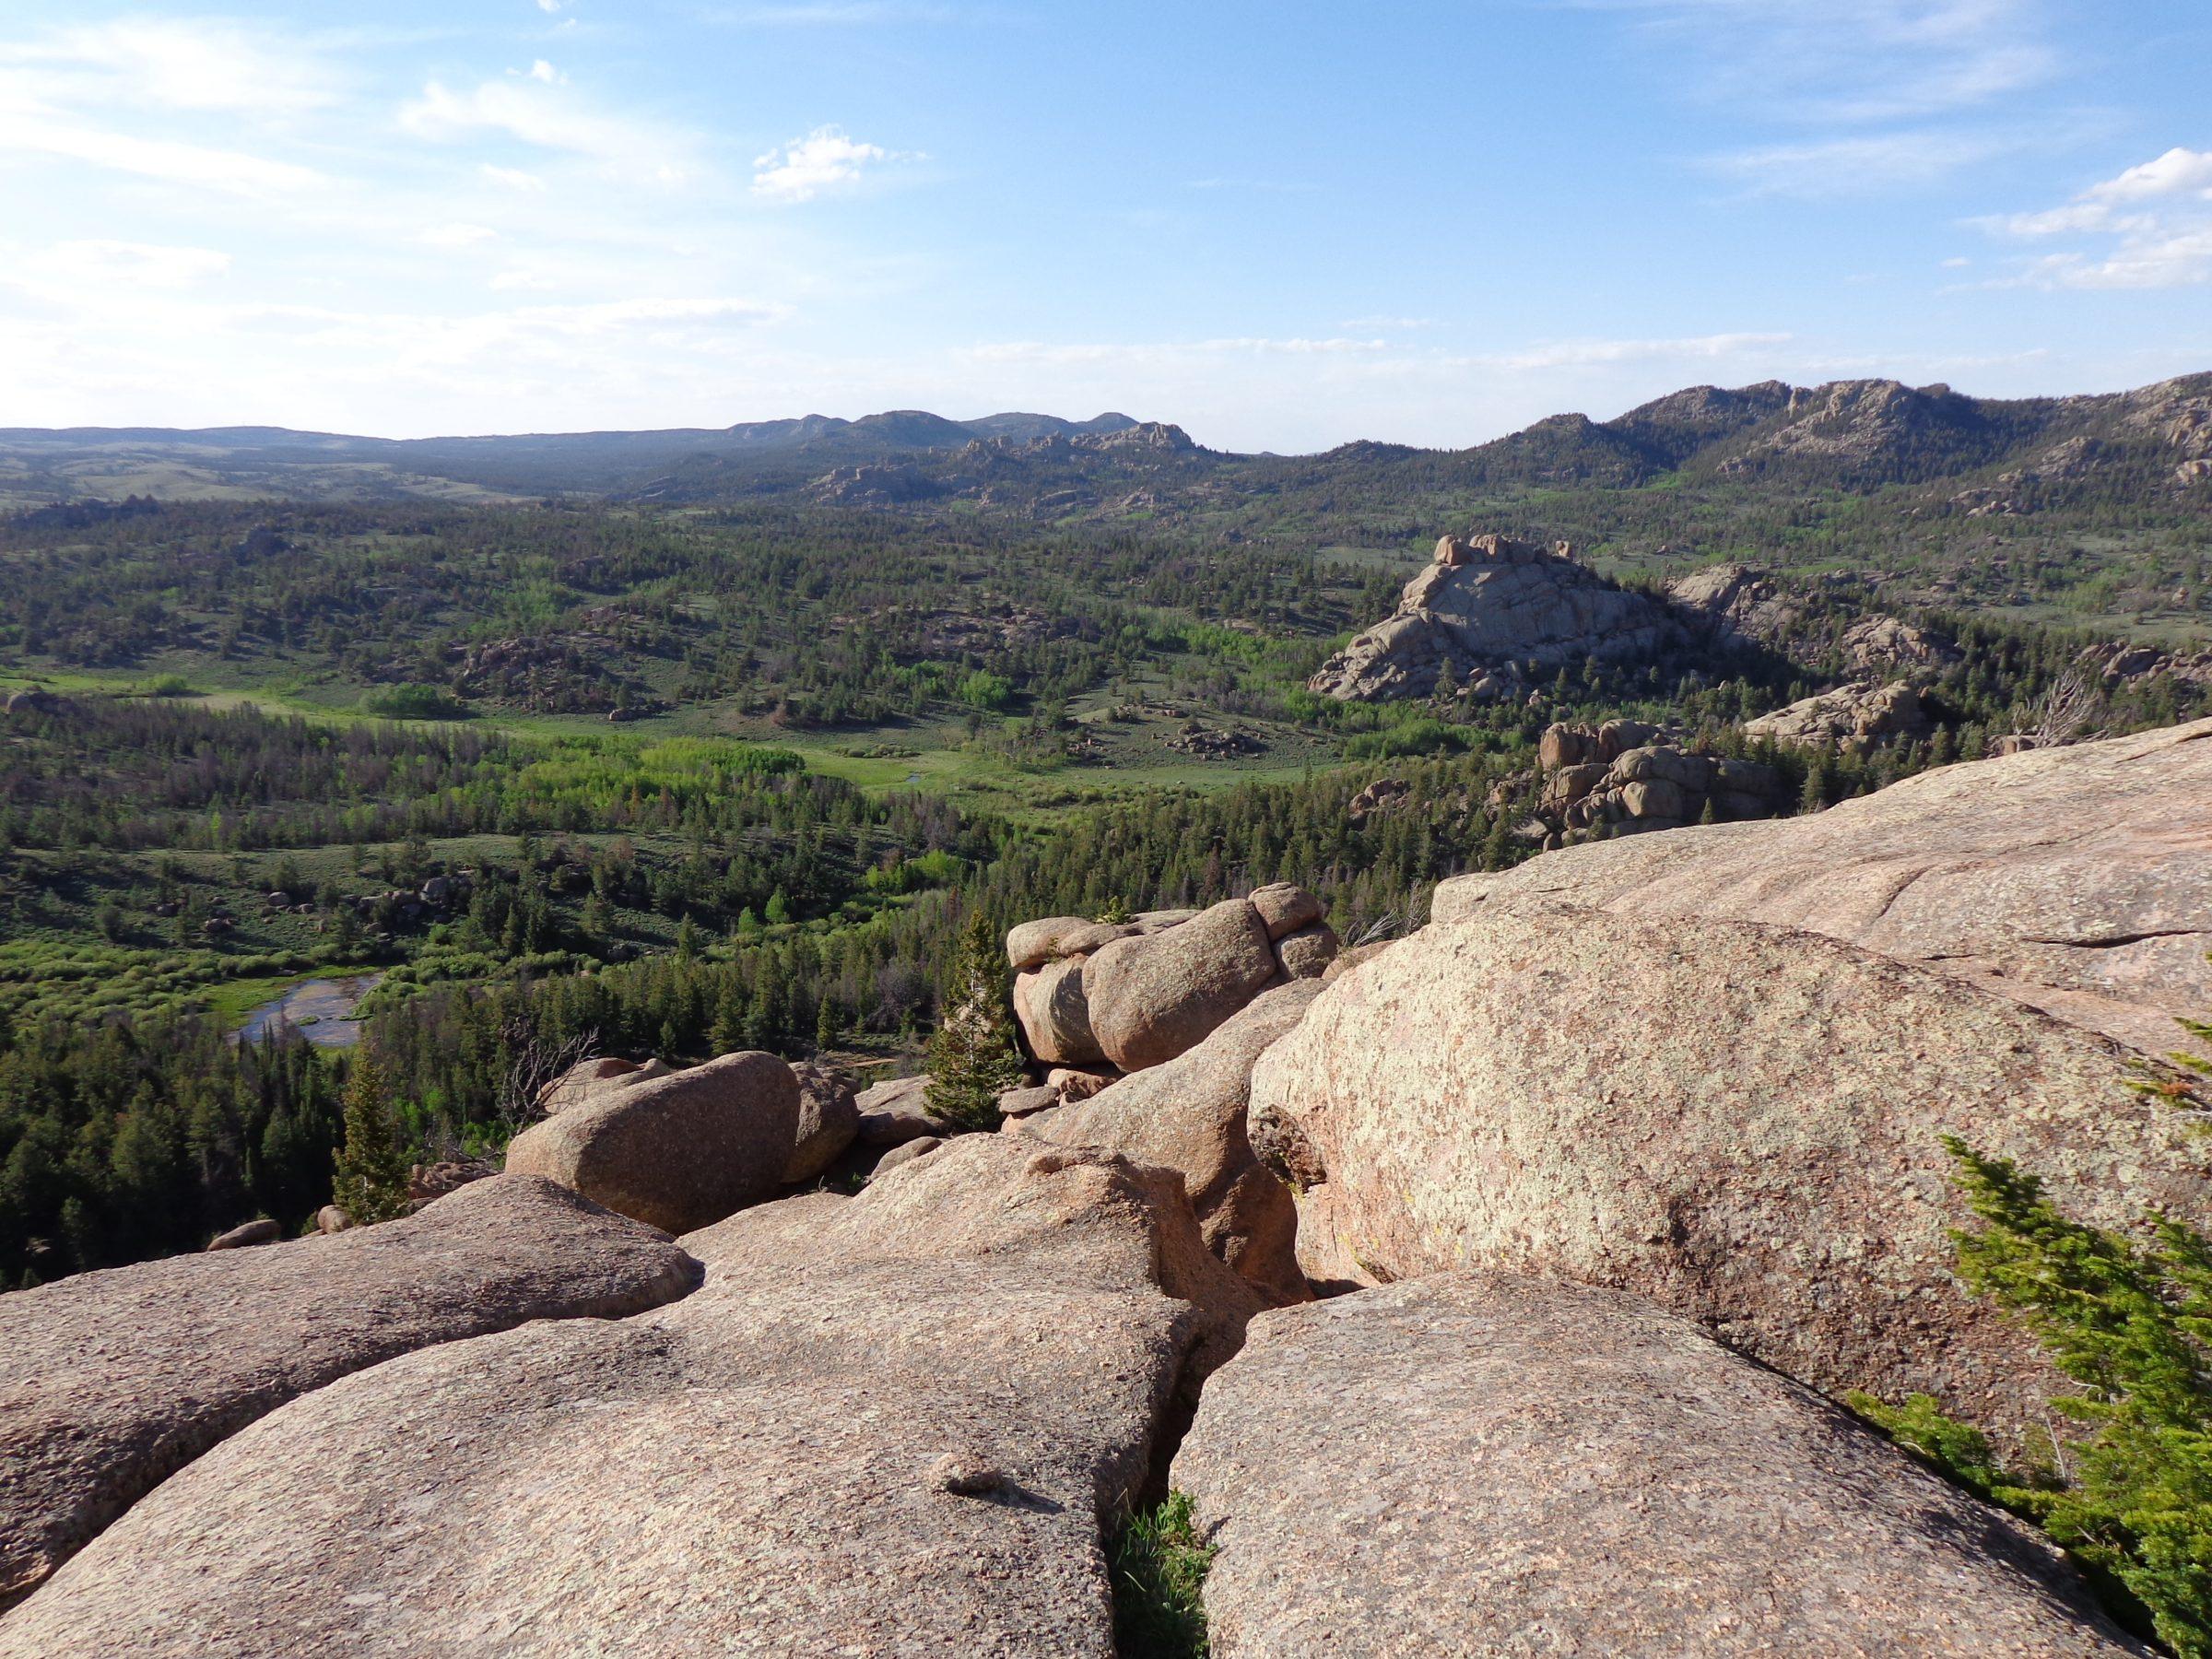 Uitzicht vanaf een rotspartij in Curt Gowdy State Park, Wyoming